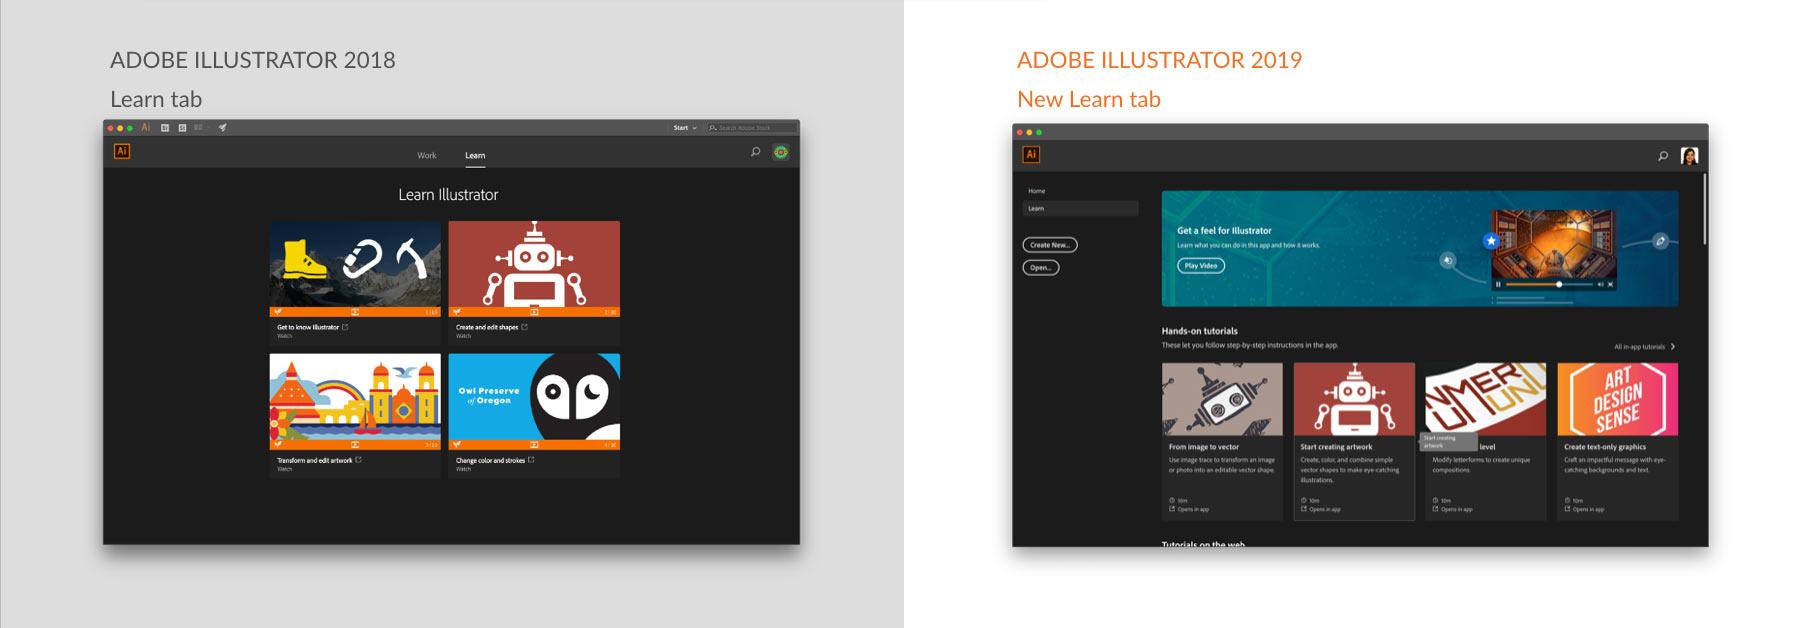 Learn on 2019 screen in Illustrator